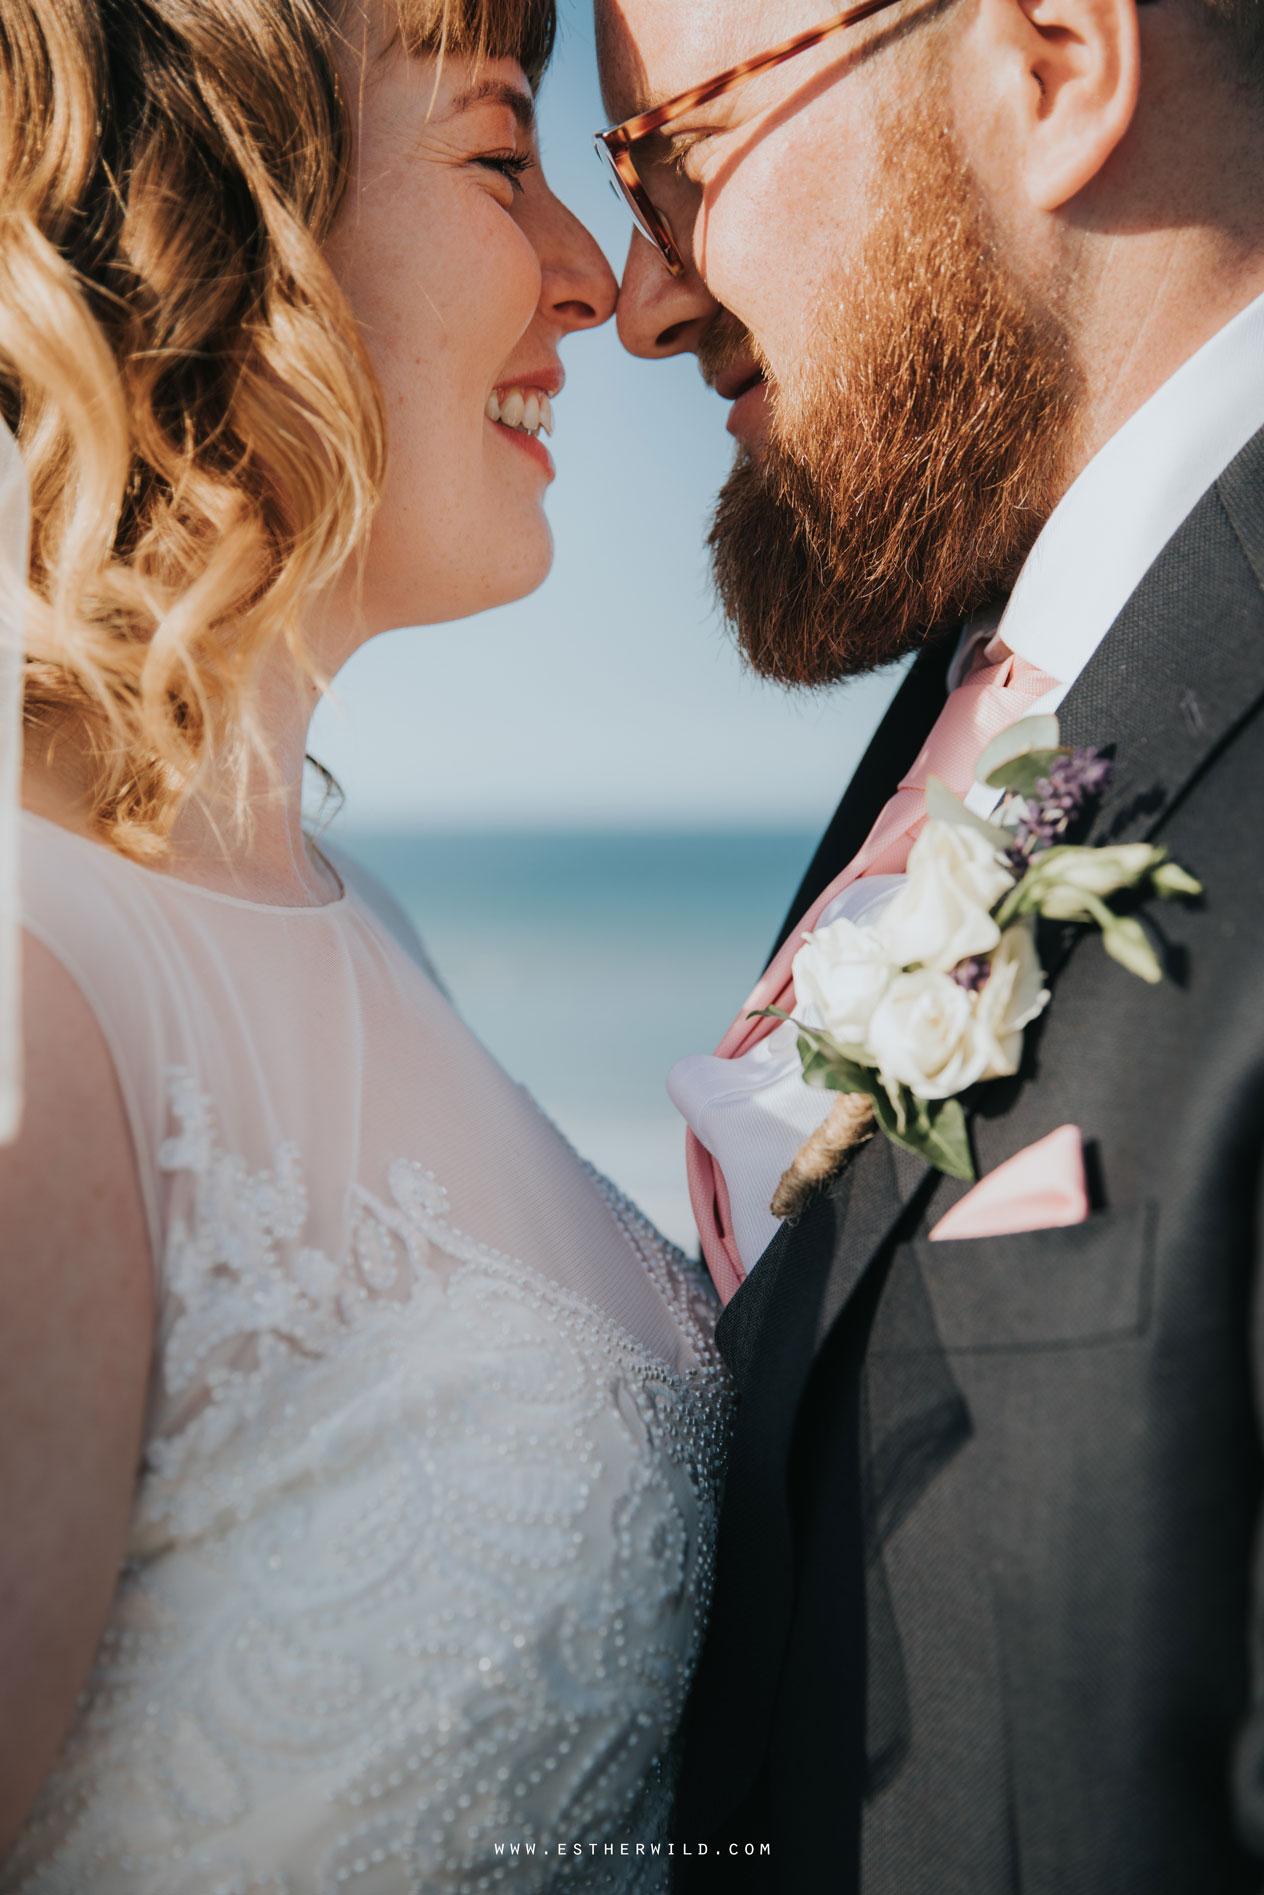 Cromer_Wedding_Beach_Outdoor_Ceremony_Norfolk_North_Lodge_Registry_Office_Rocket_House_Cafe_Cromer_Pier_IMG_4366.jpg